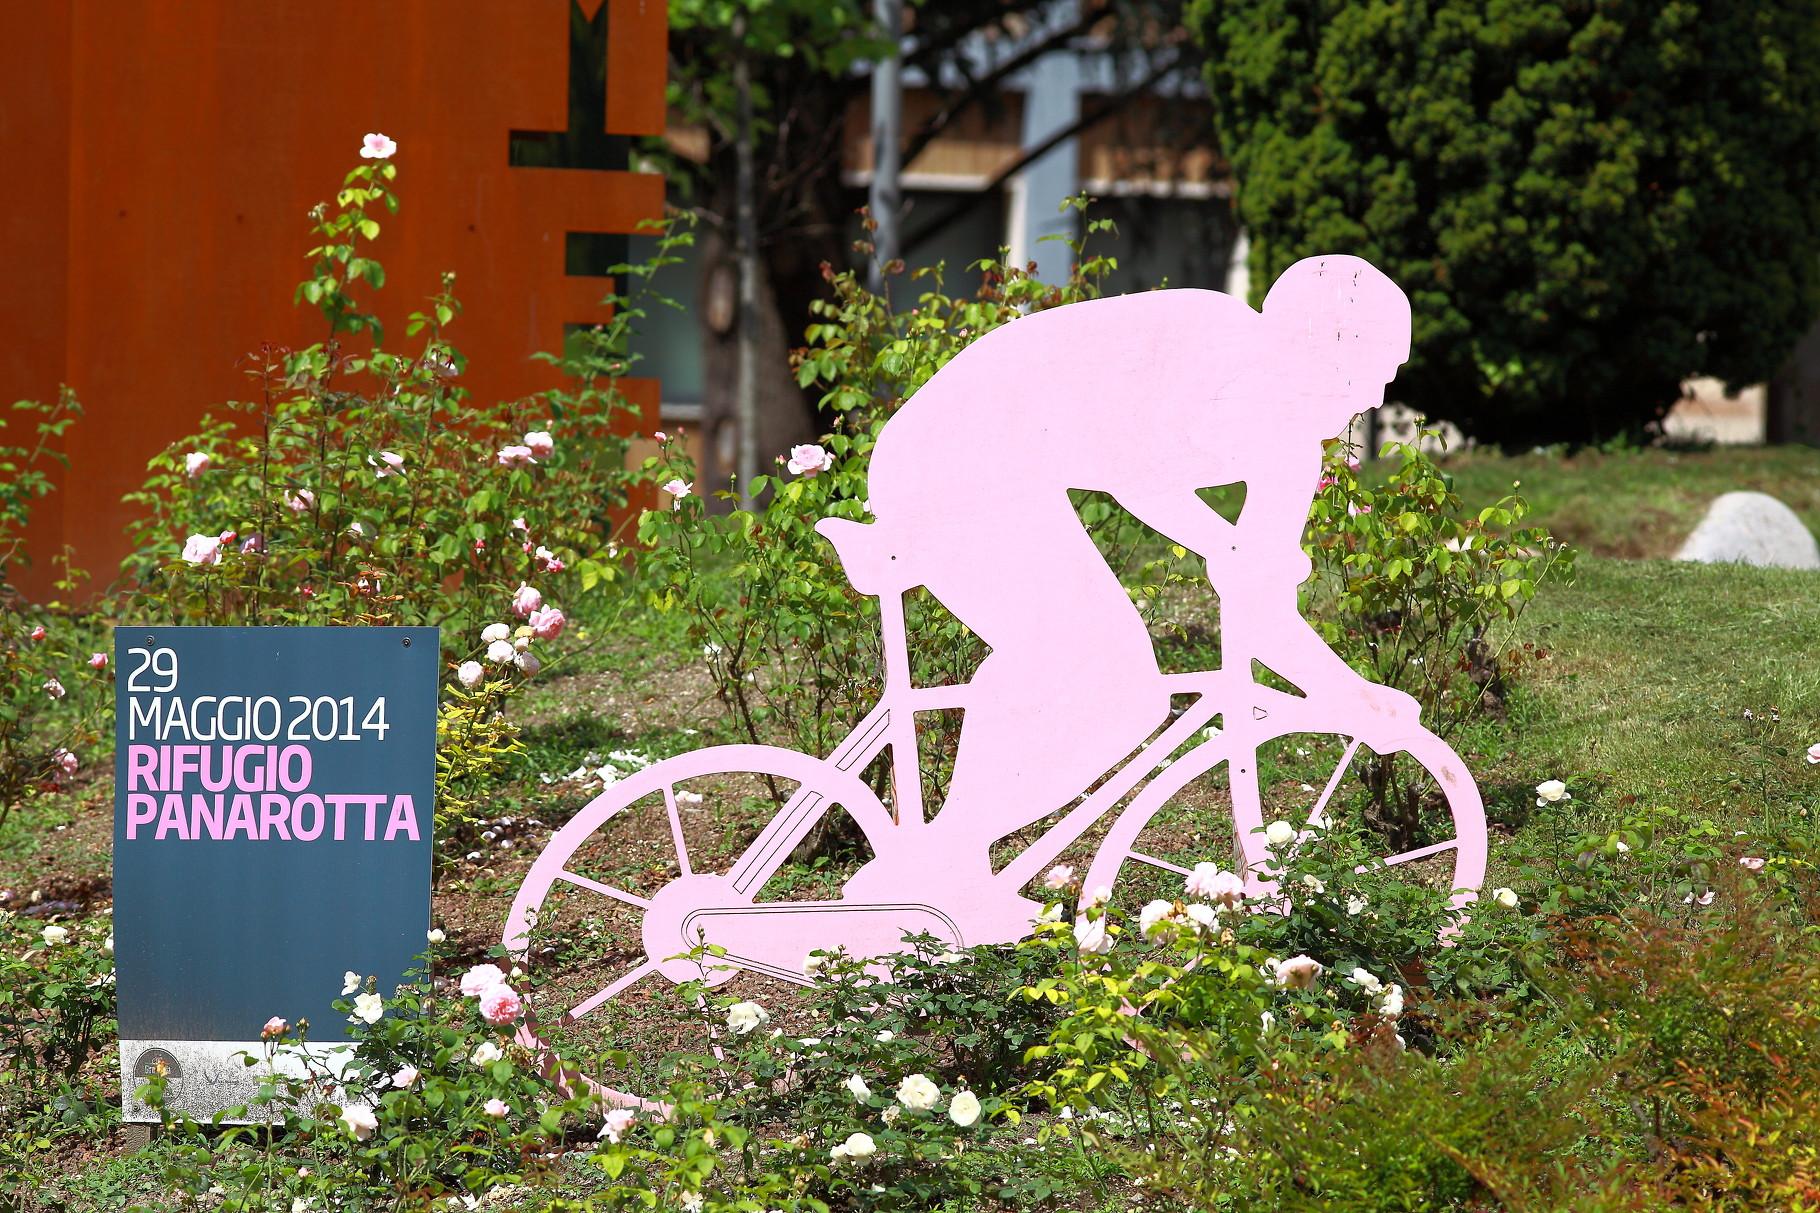 Levico Terme - Giro d'Italia 2014